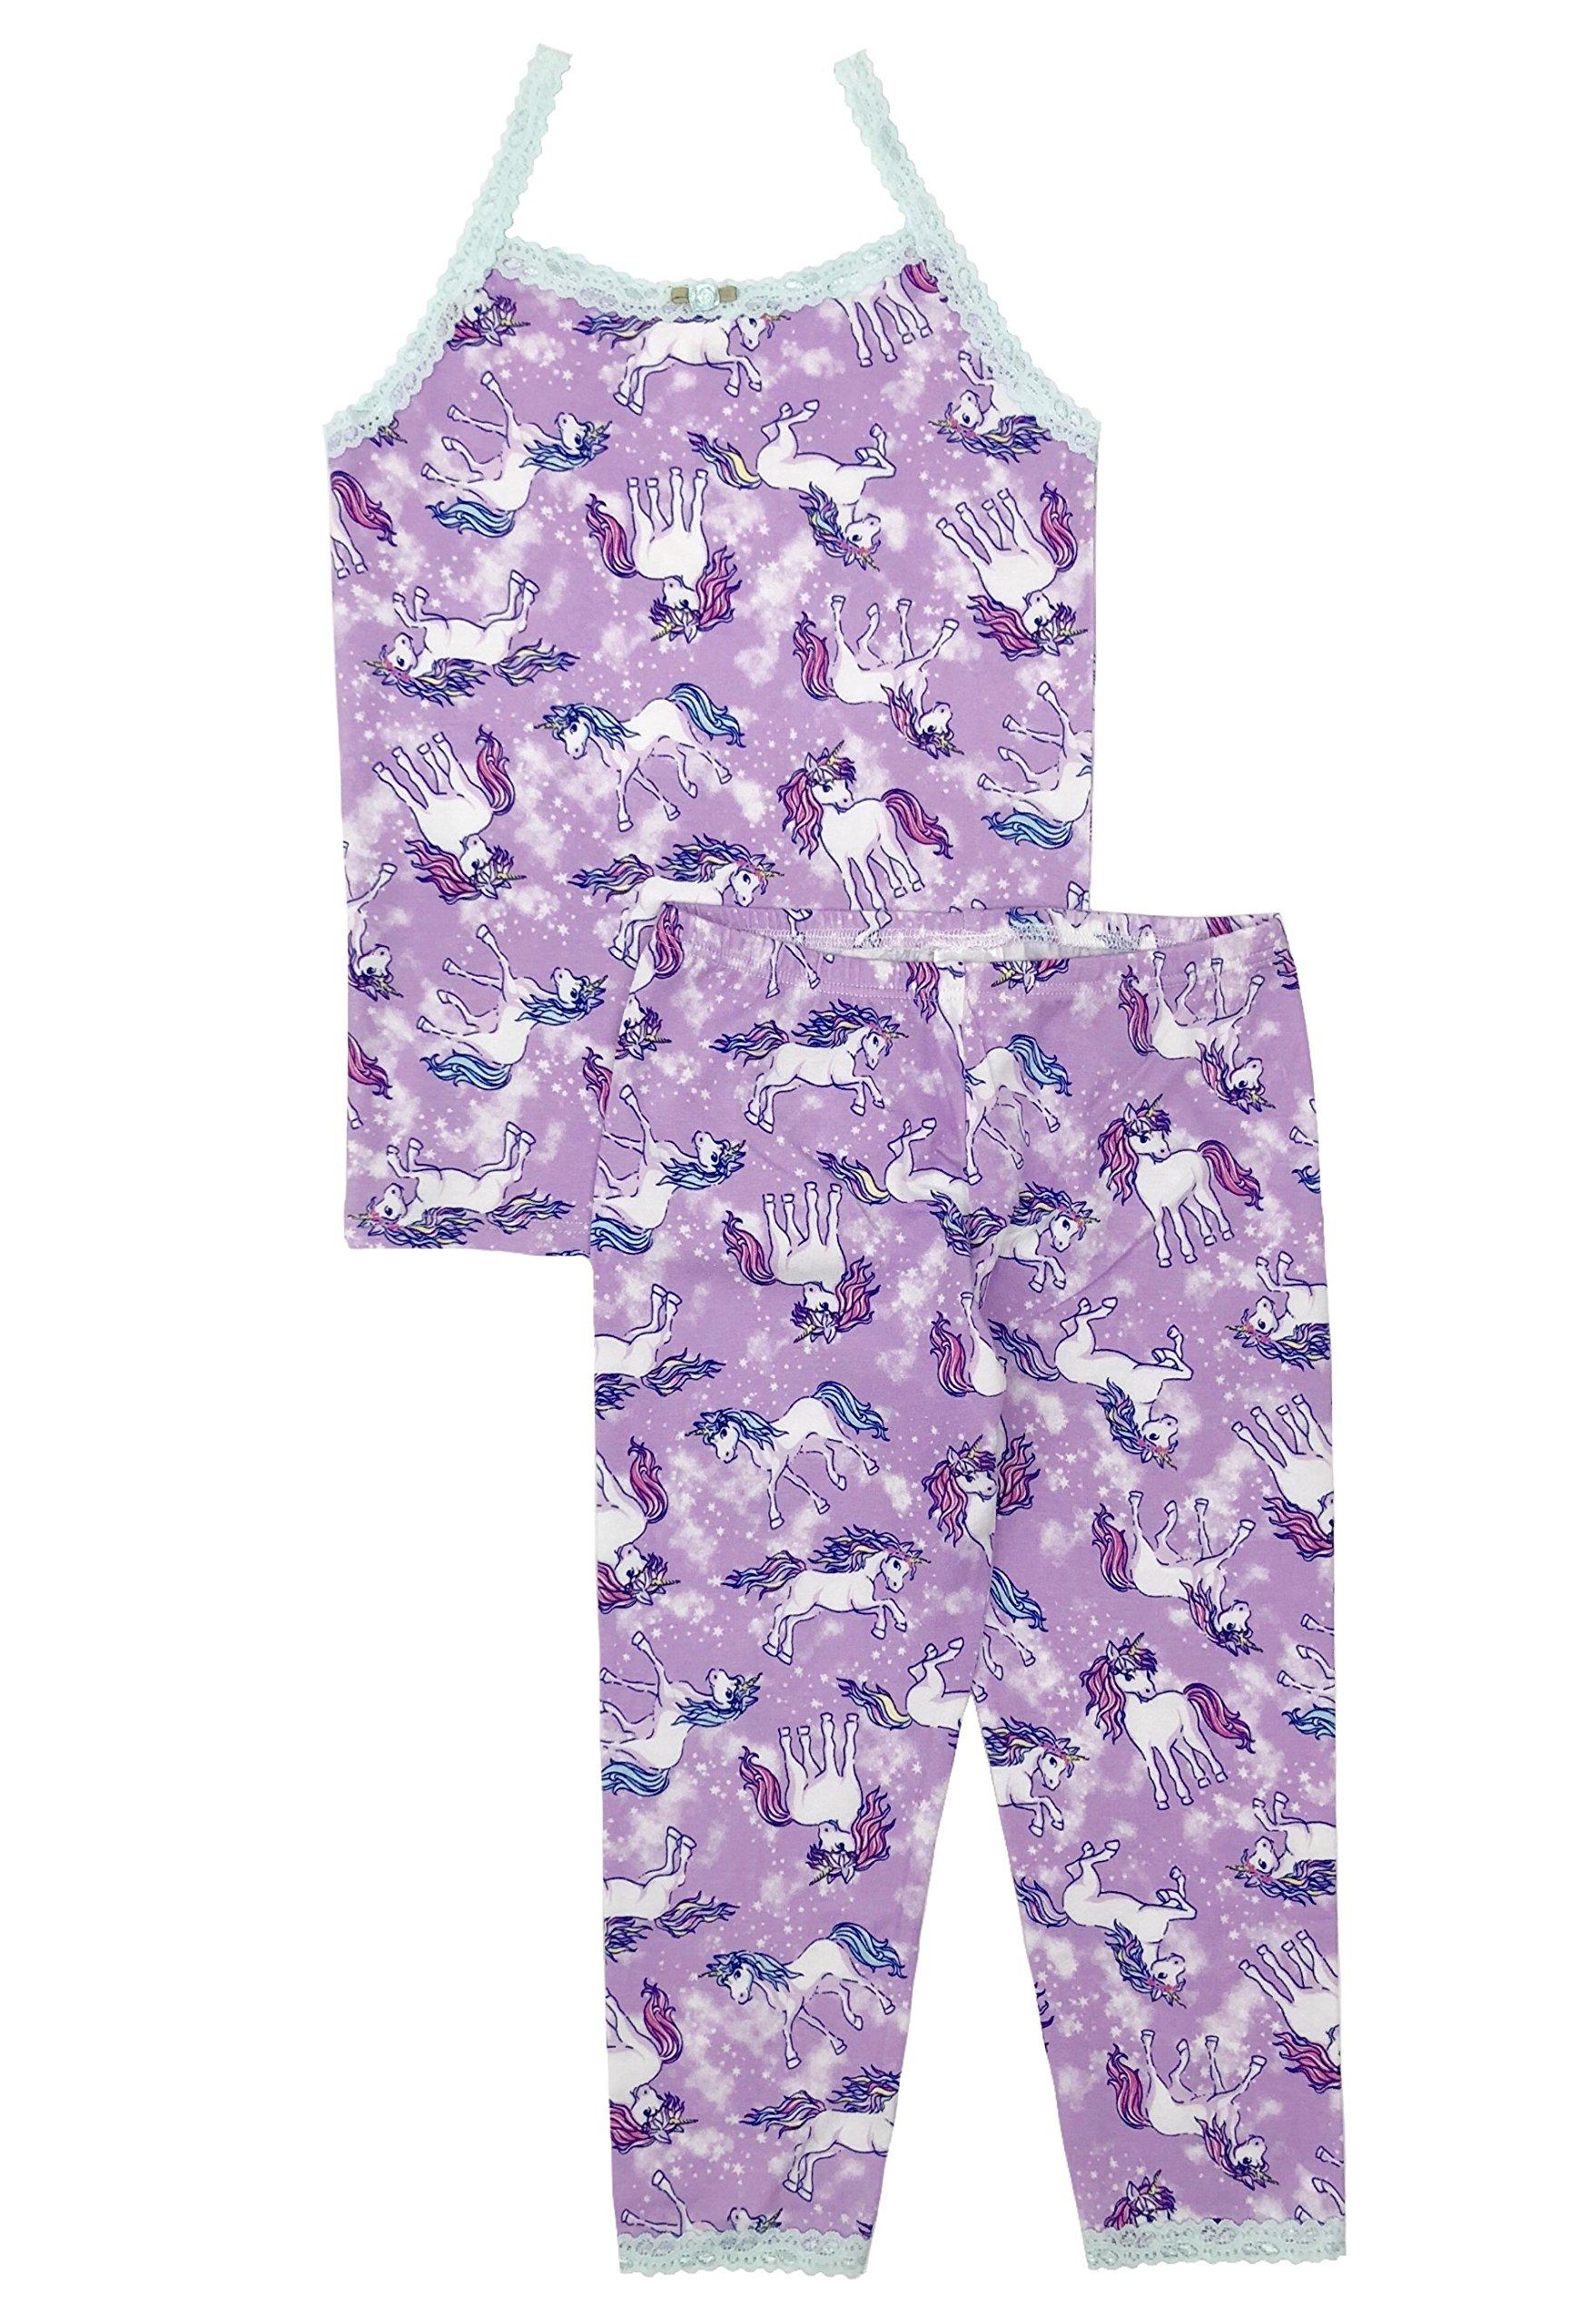 Esme Girl's Sleepwear Camisole Leggings Set-5 Unicorn by Esme (Image #1)